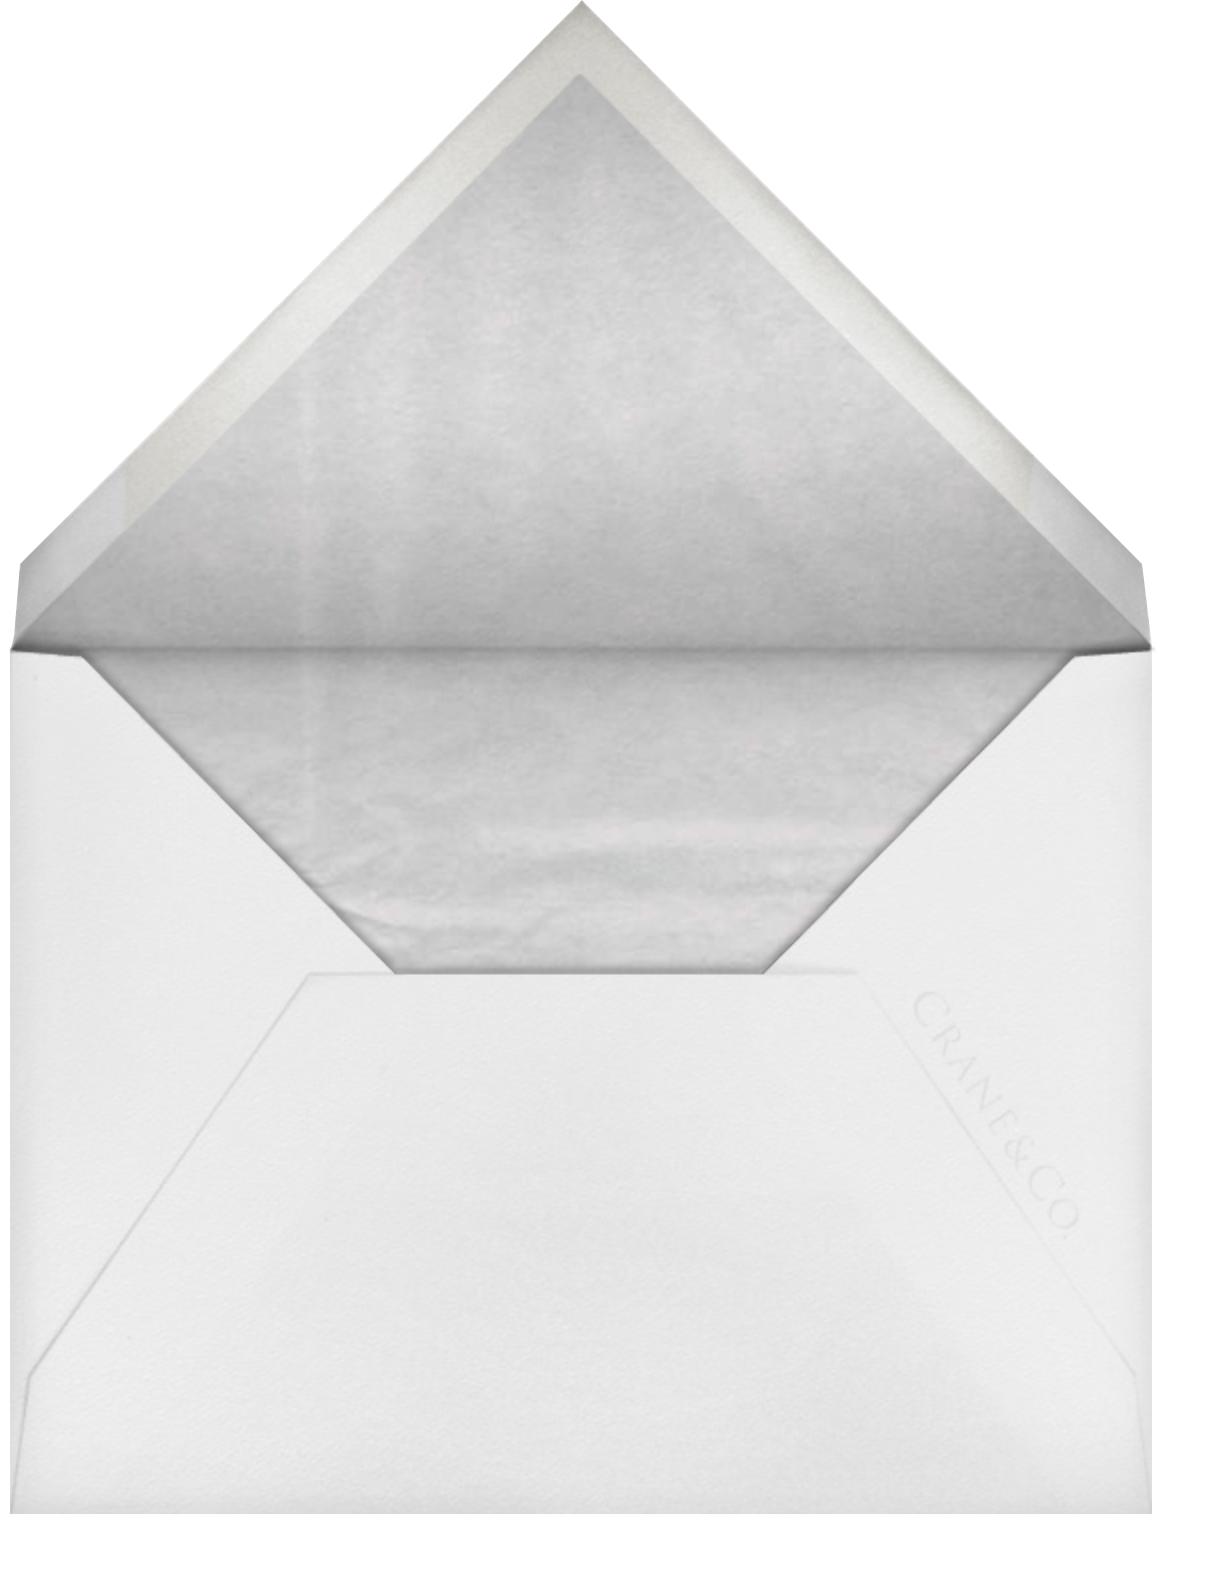 Meet Me in the Menagerie - Platinum - Crane & Co. - All - envelope back